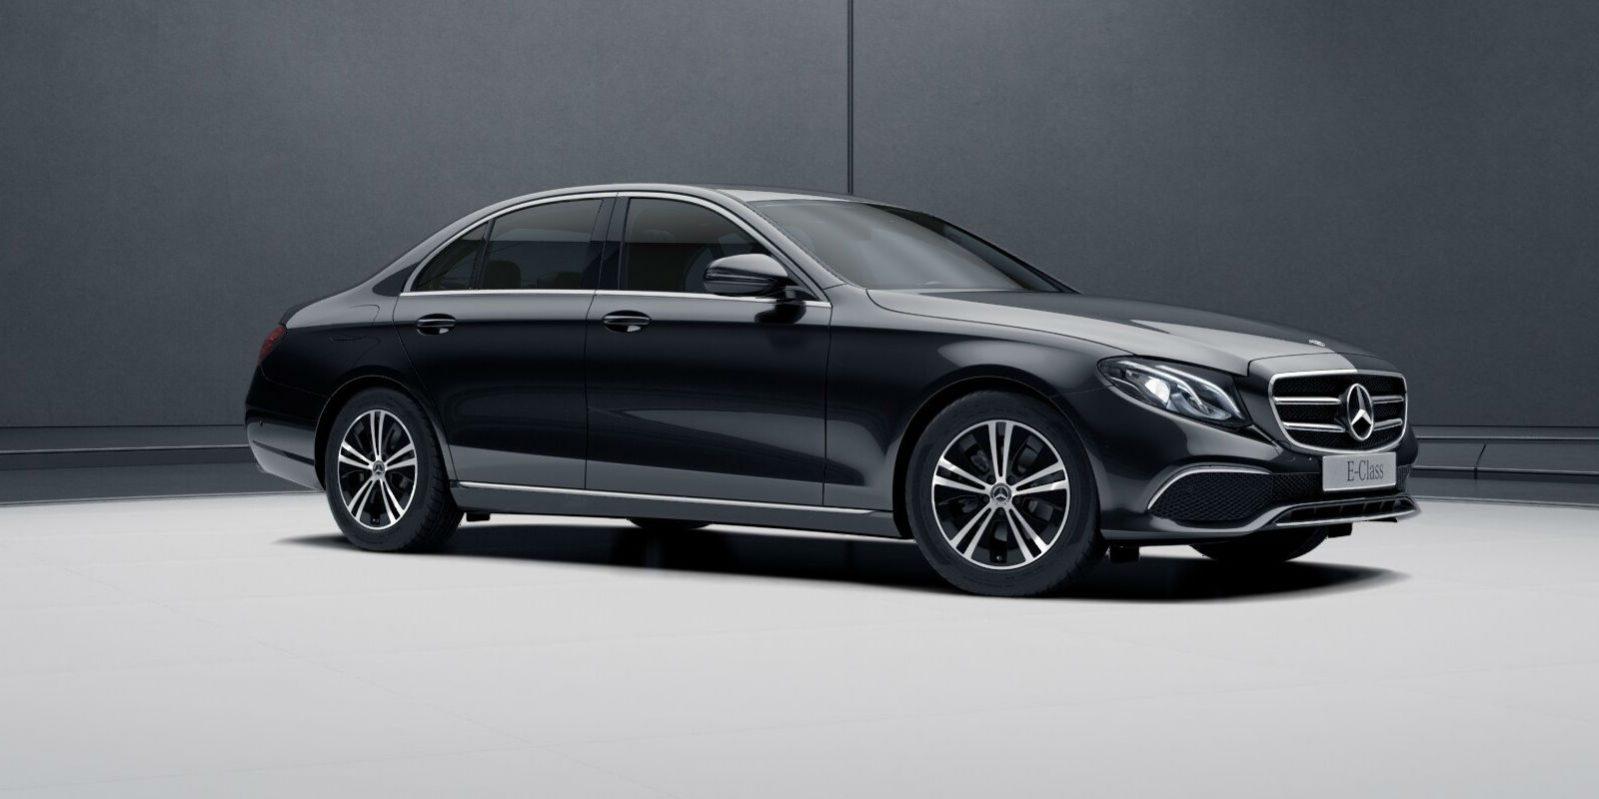 2019 Mercedes Benz E300 Stewart S Automotive Group